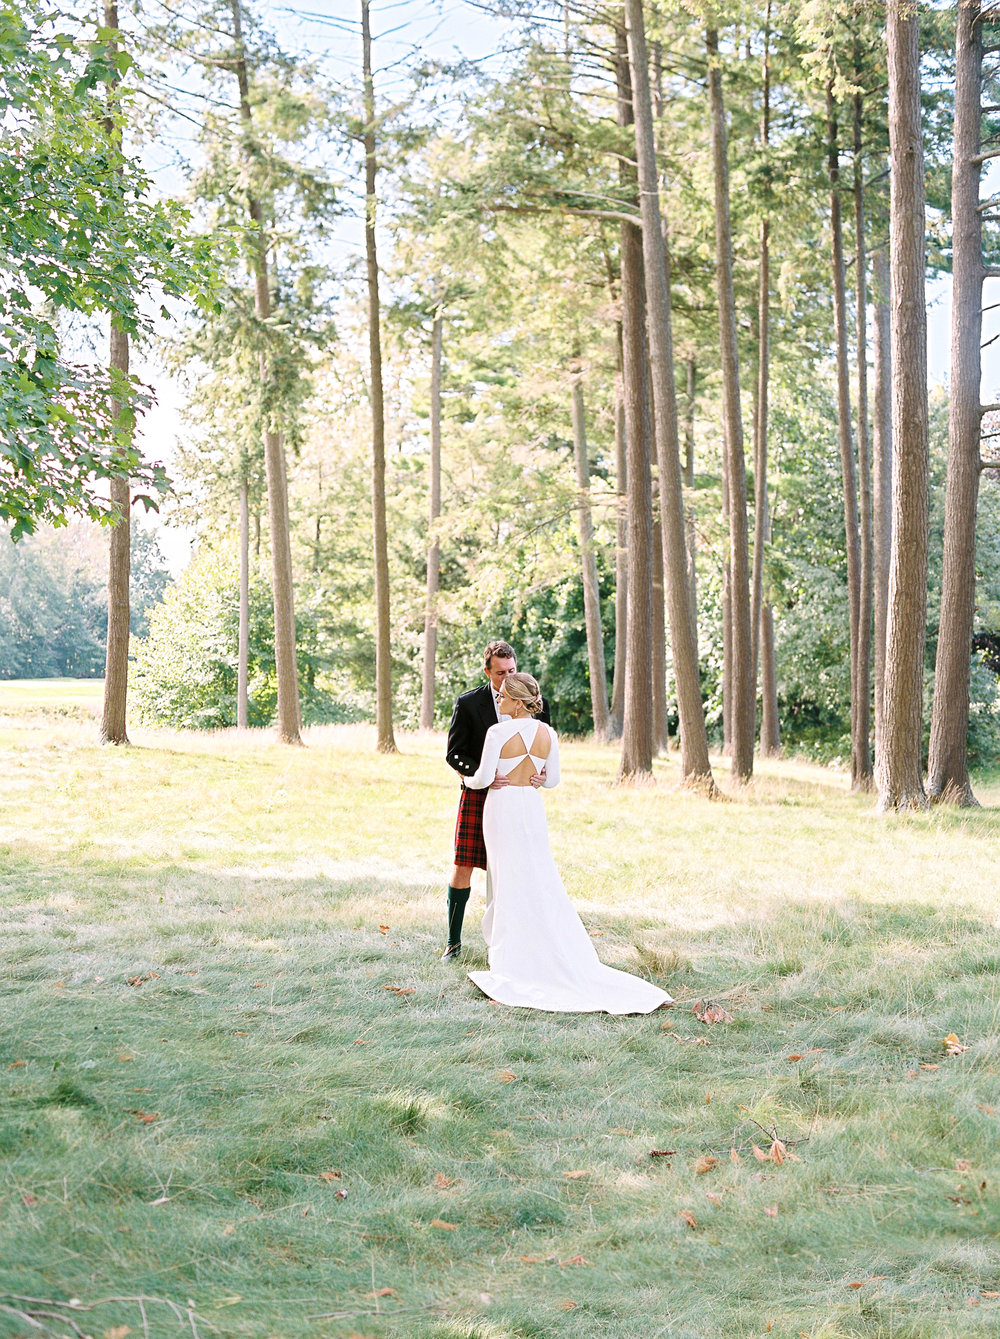 0111-Geneva-Ian-Wedding-Toronto Golf Club-When He Found Her-TorontoPhotographer.jpg